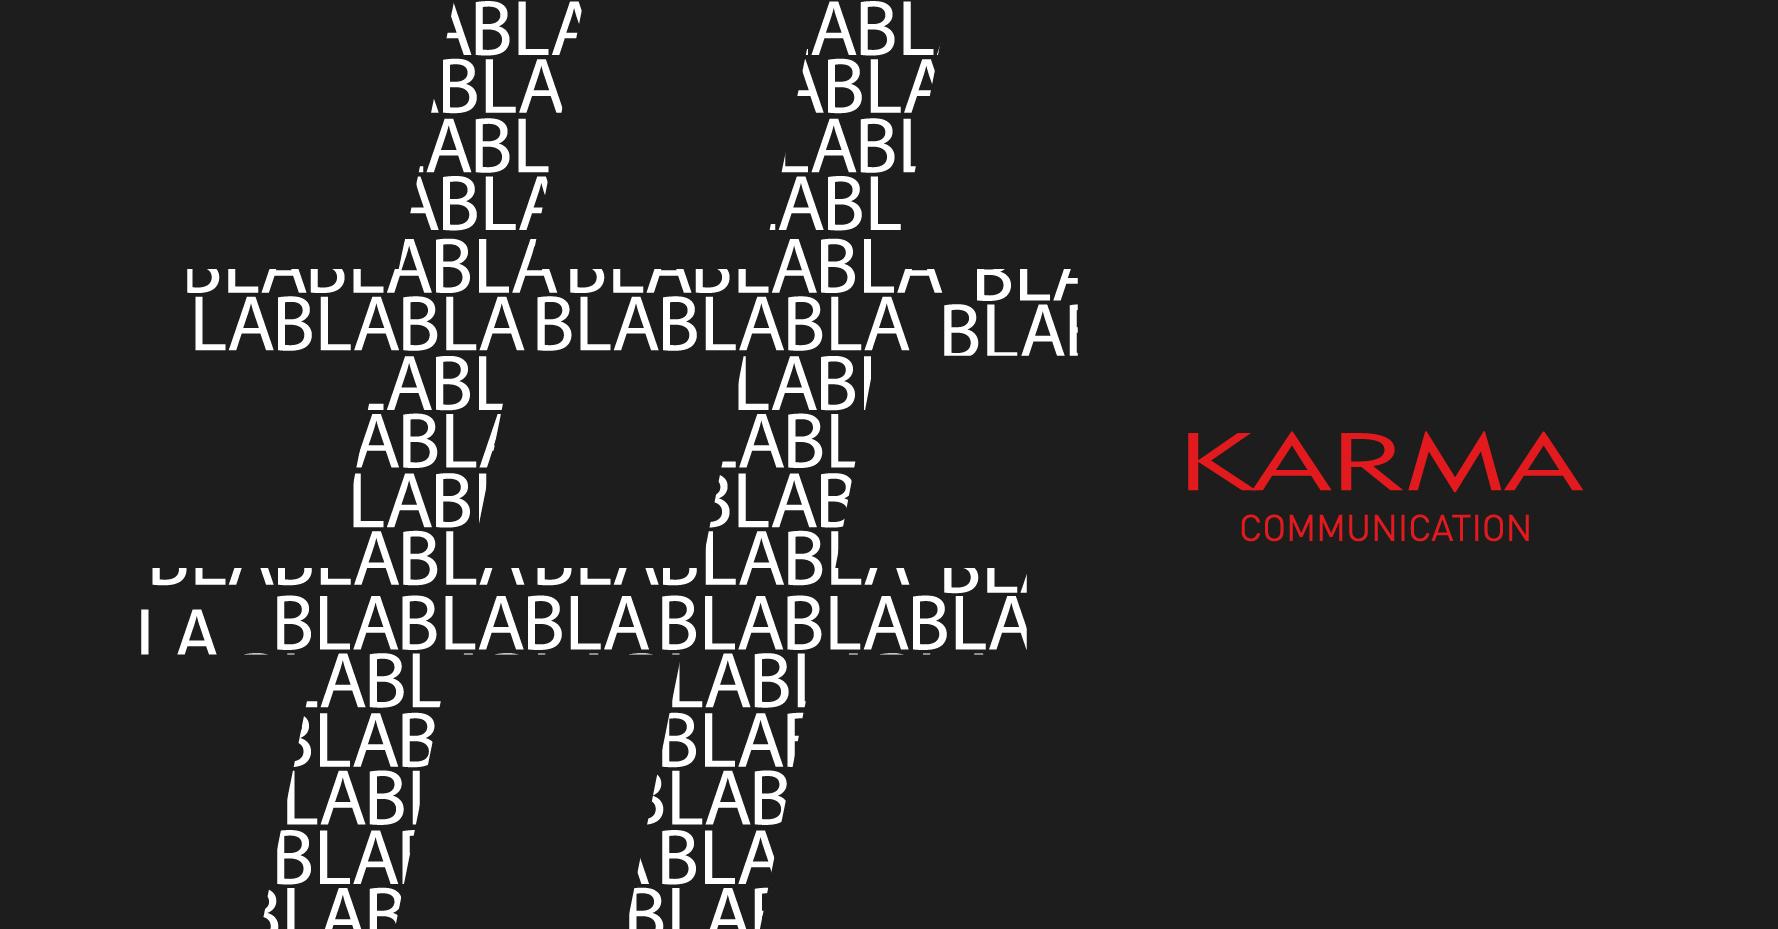 Karma Communication - La follia degli hashtag